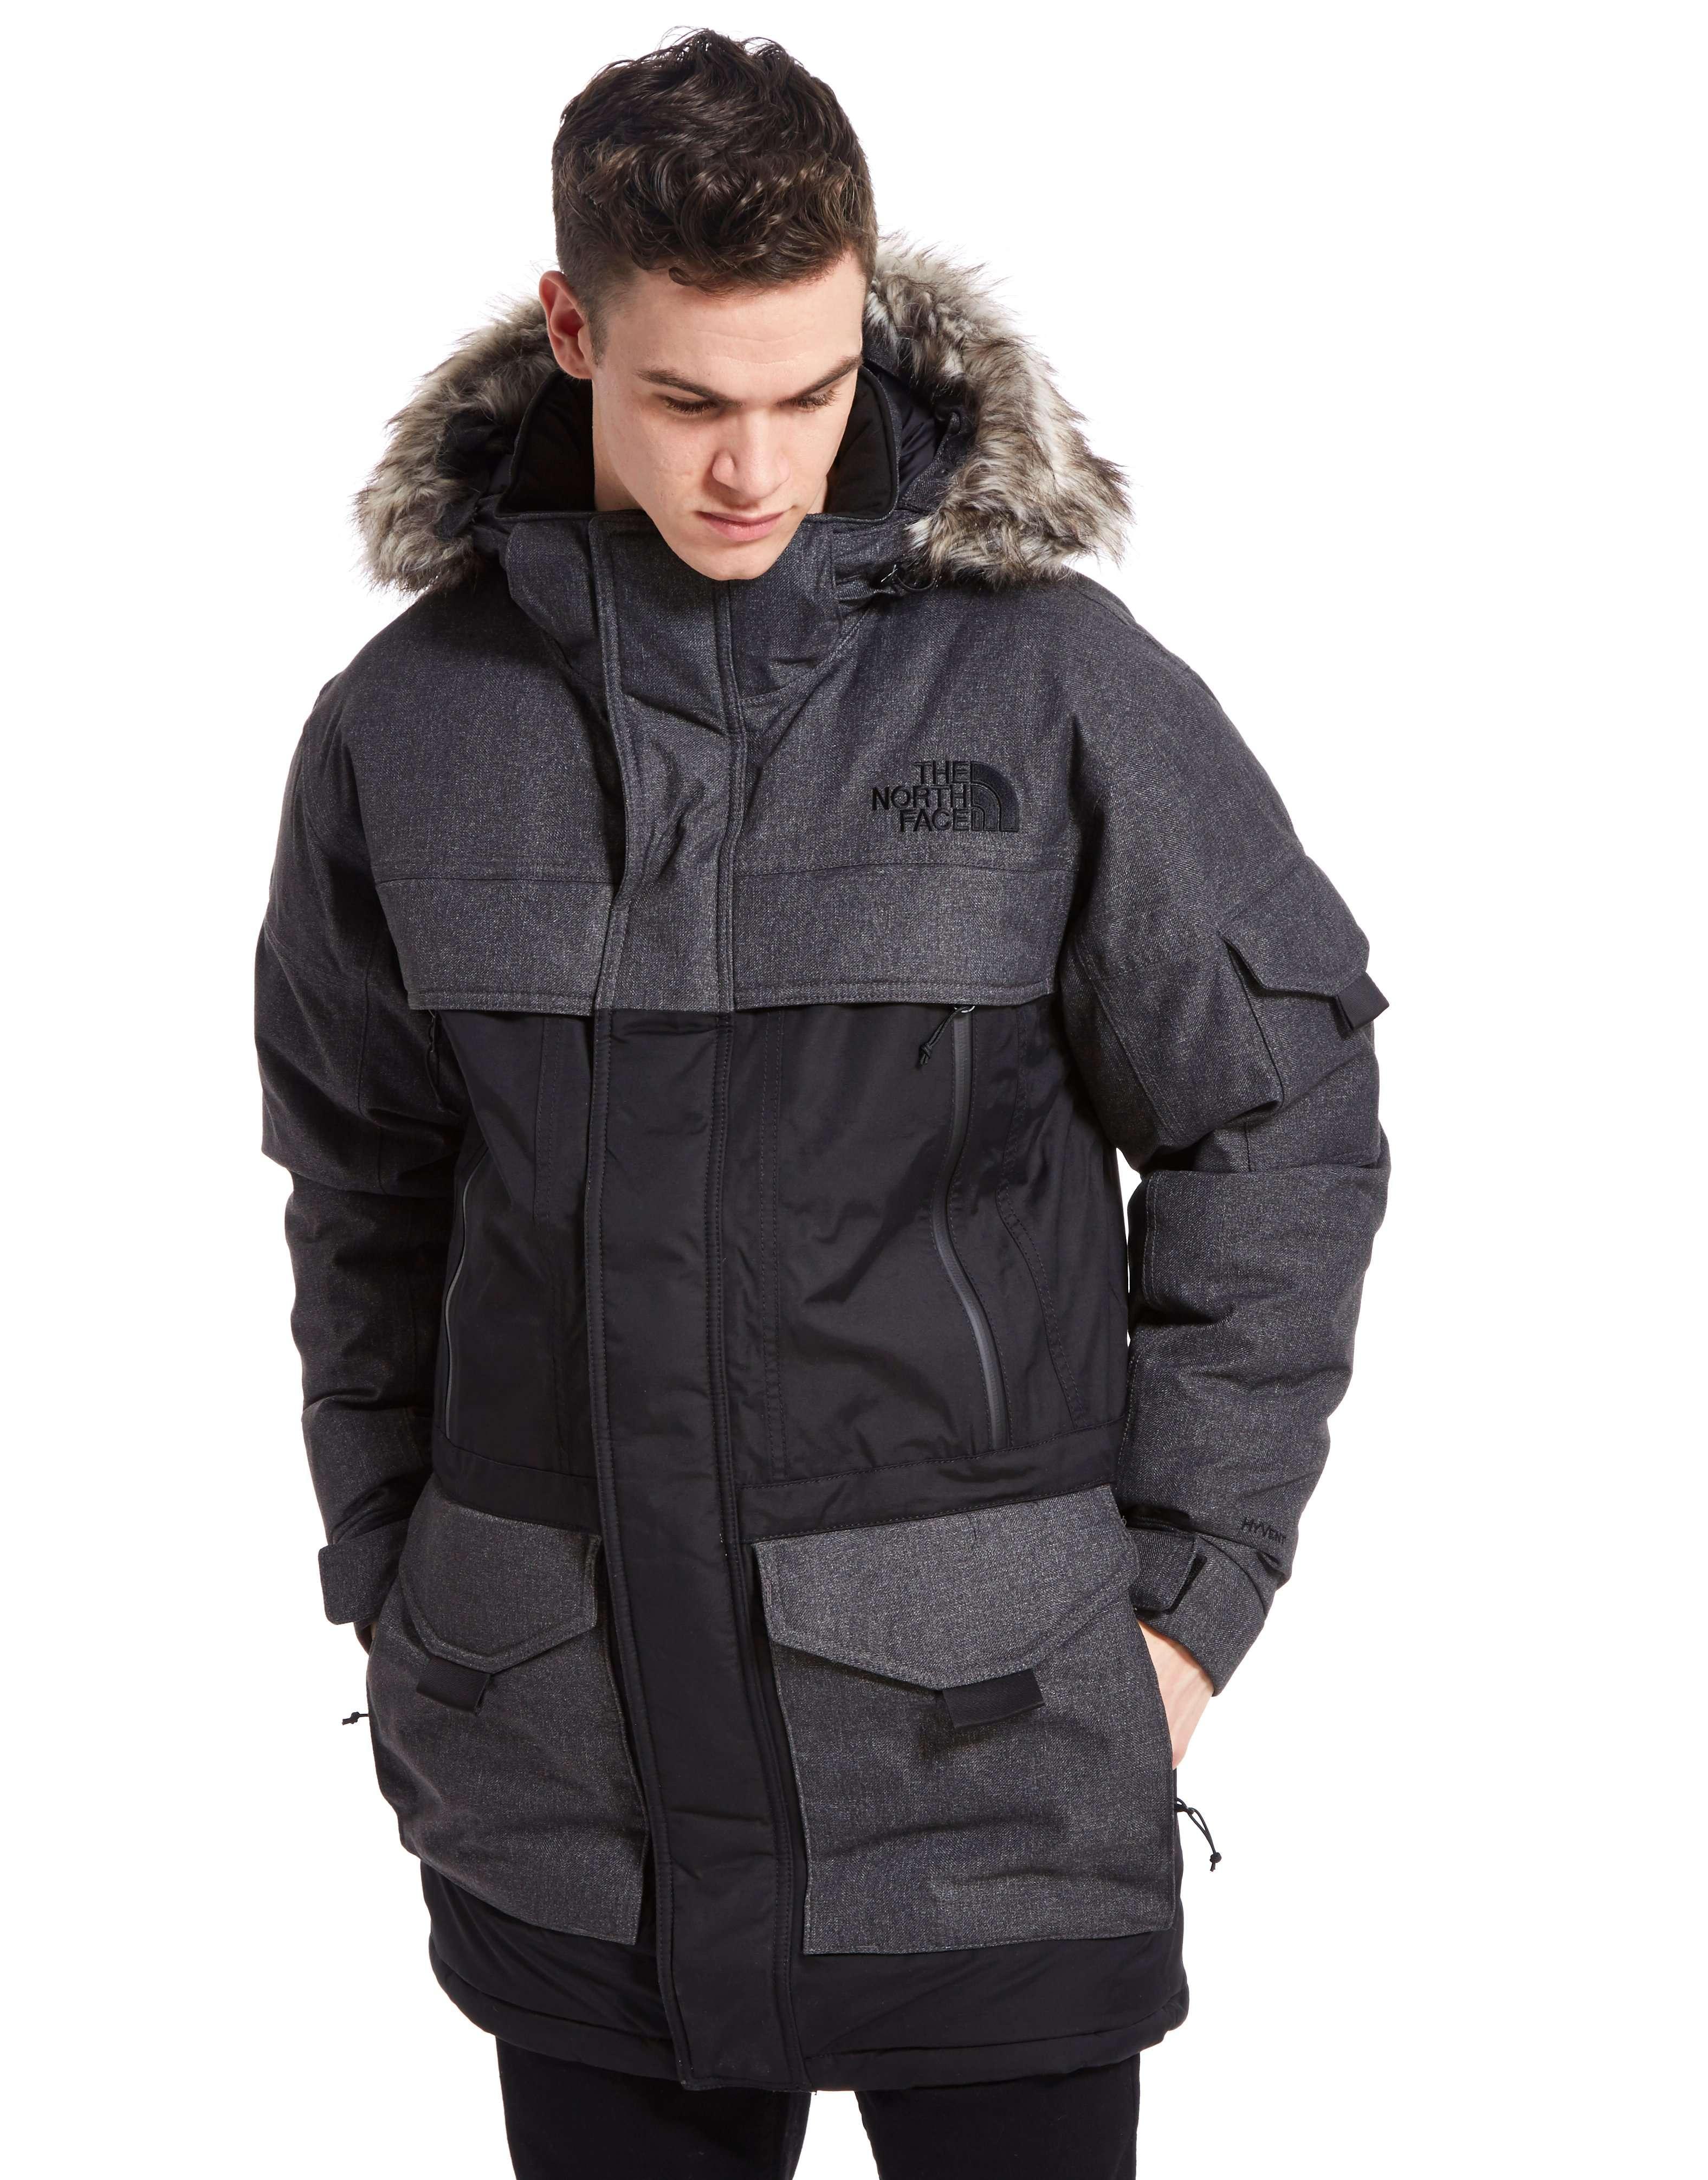 The North Face McMurdo II Parka Jacket | JD Sports